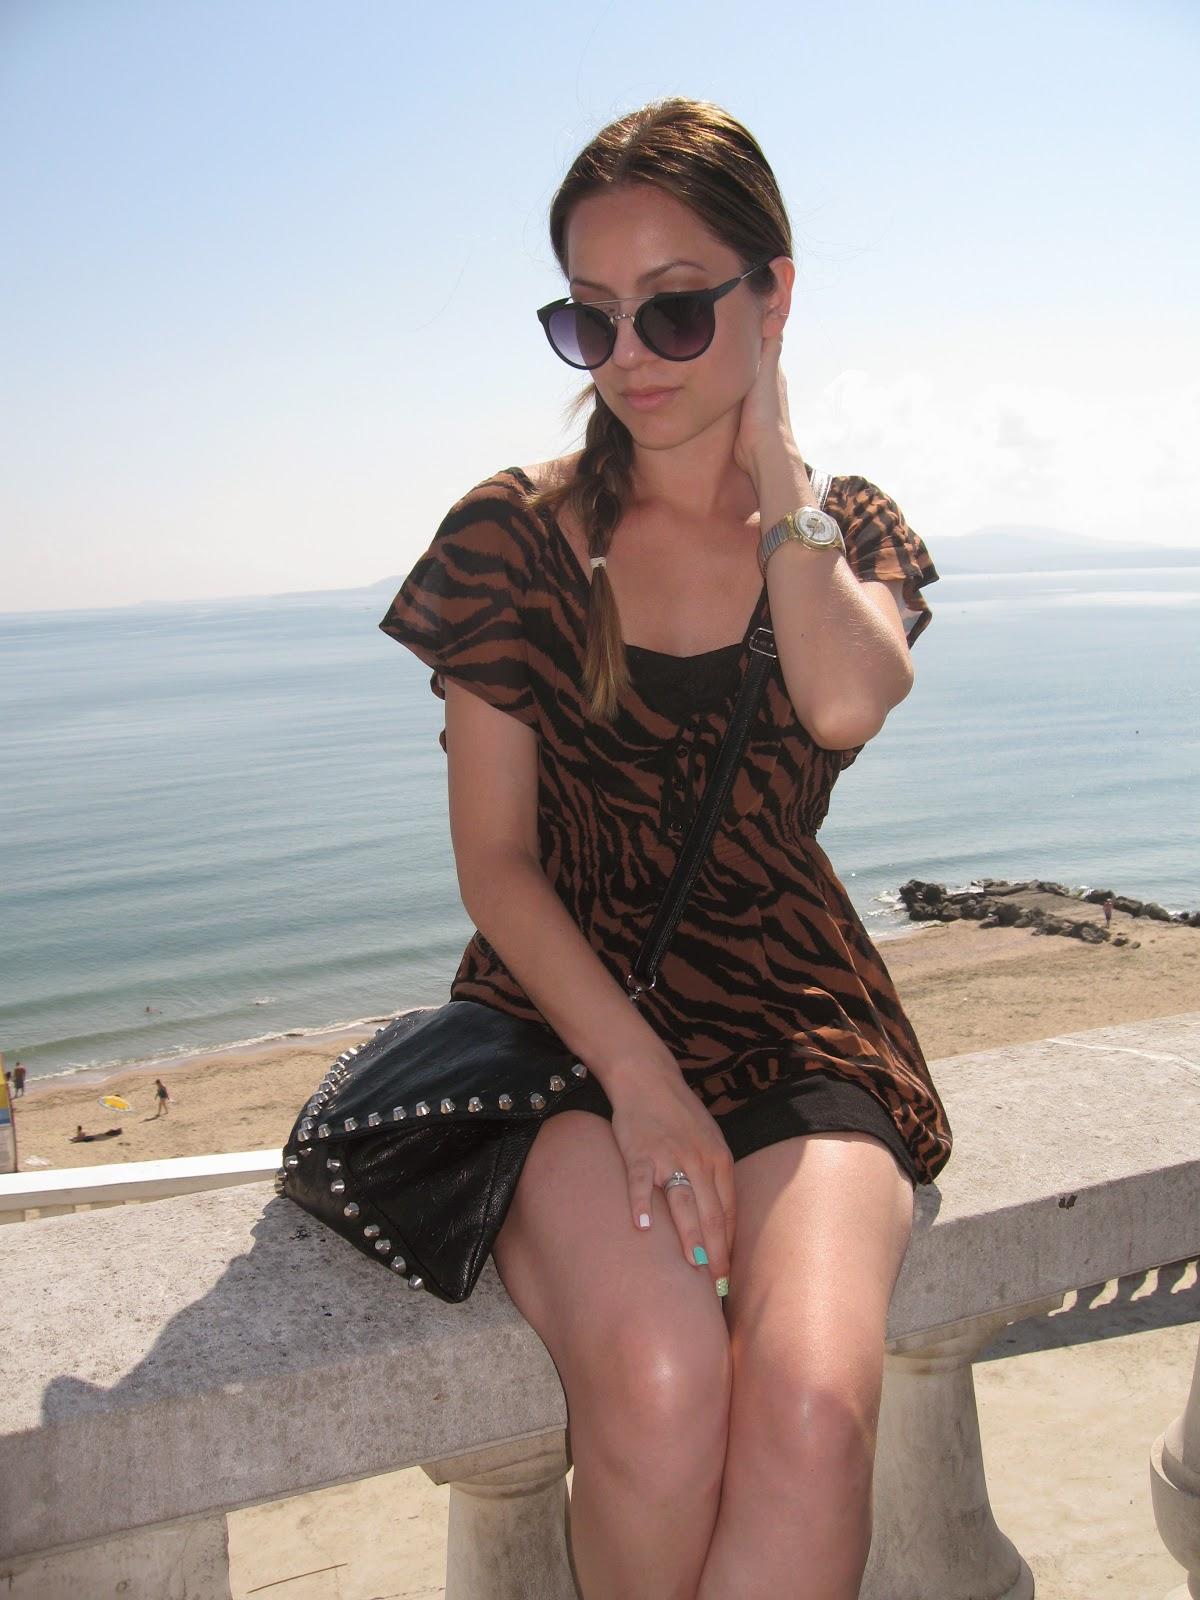 bulgaria vacation 2014, burgas bulgaria, nessebar bulgaria, summer vacation, sunny beach bulgaria, animal print top